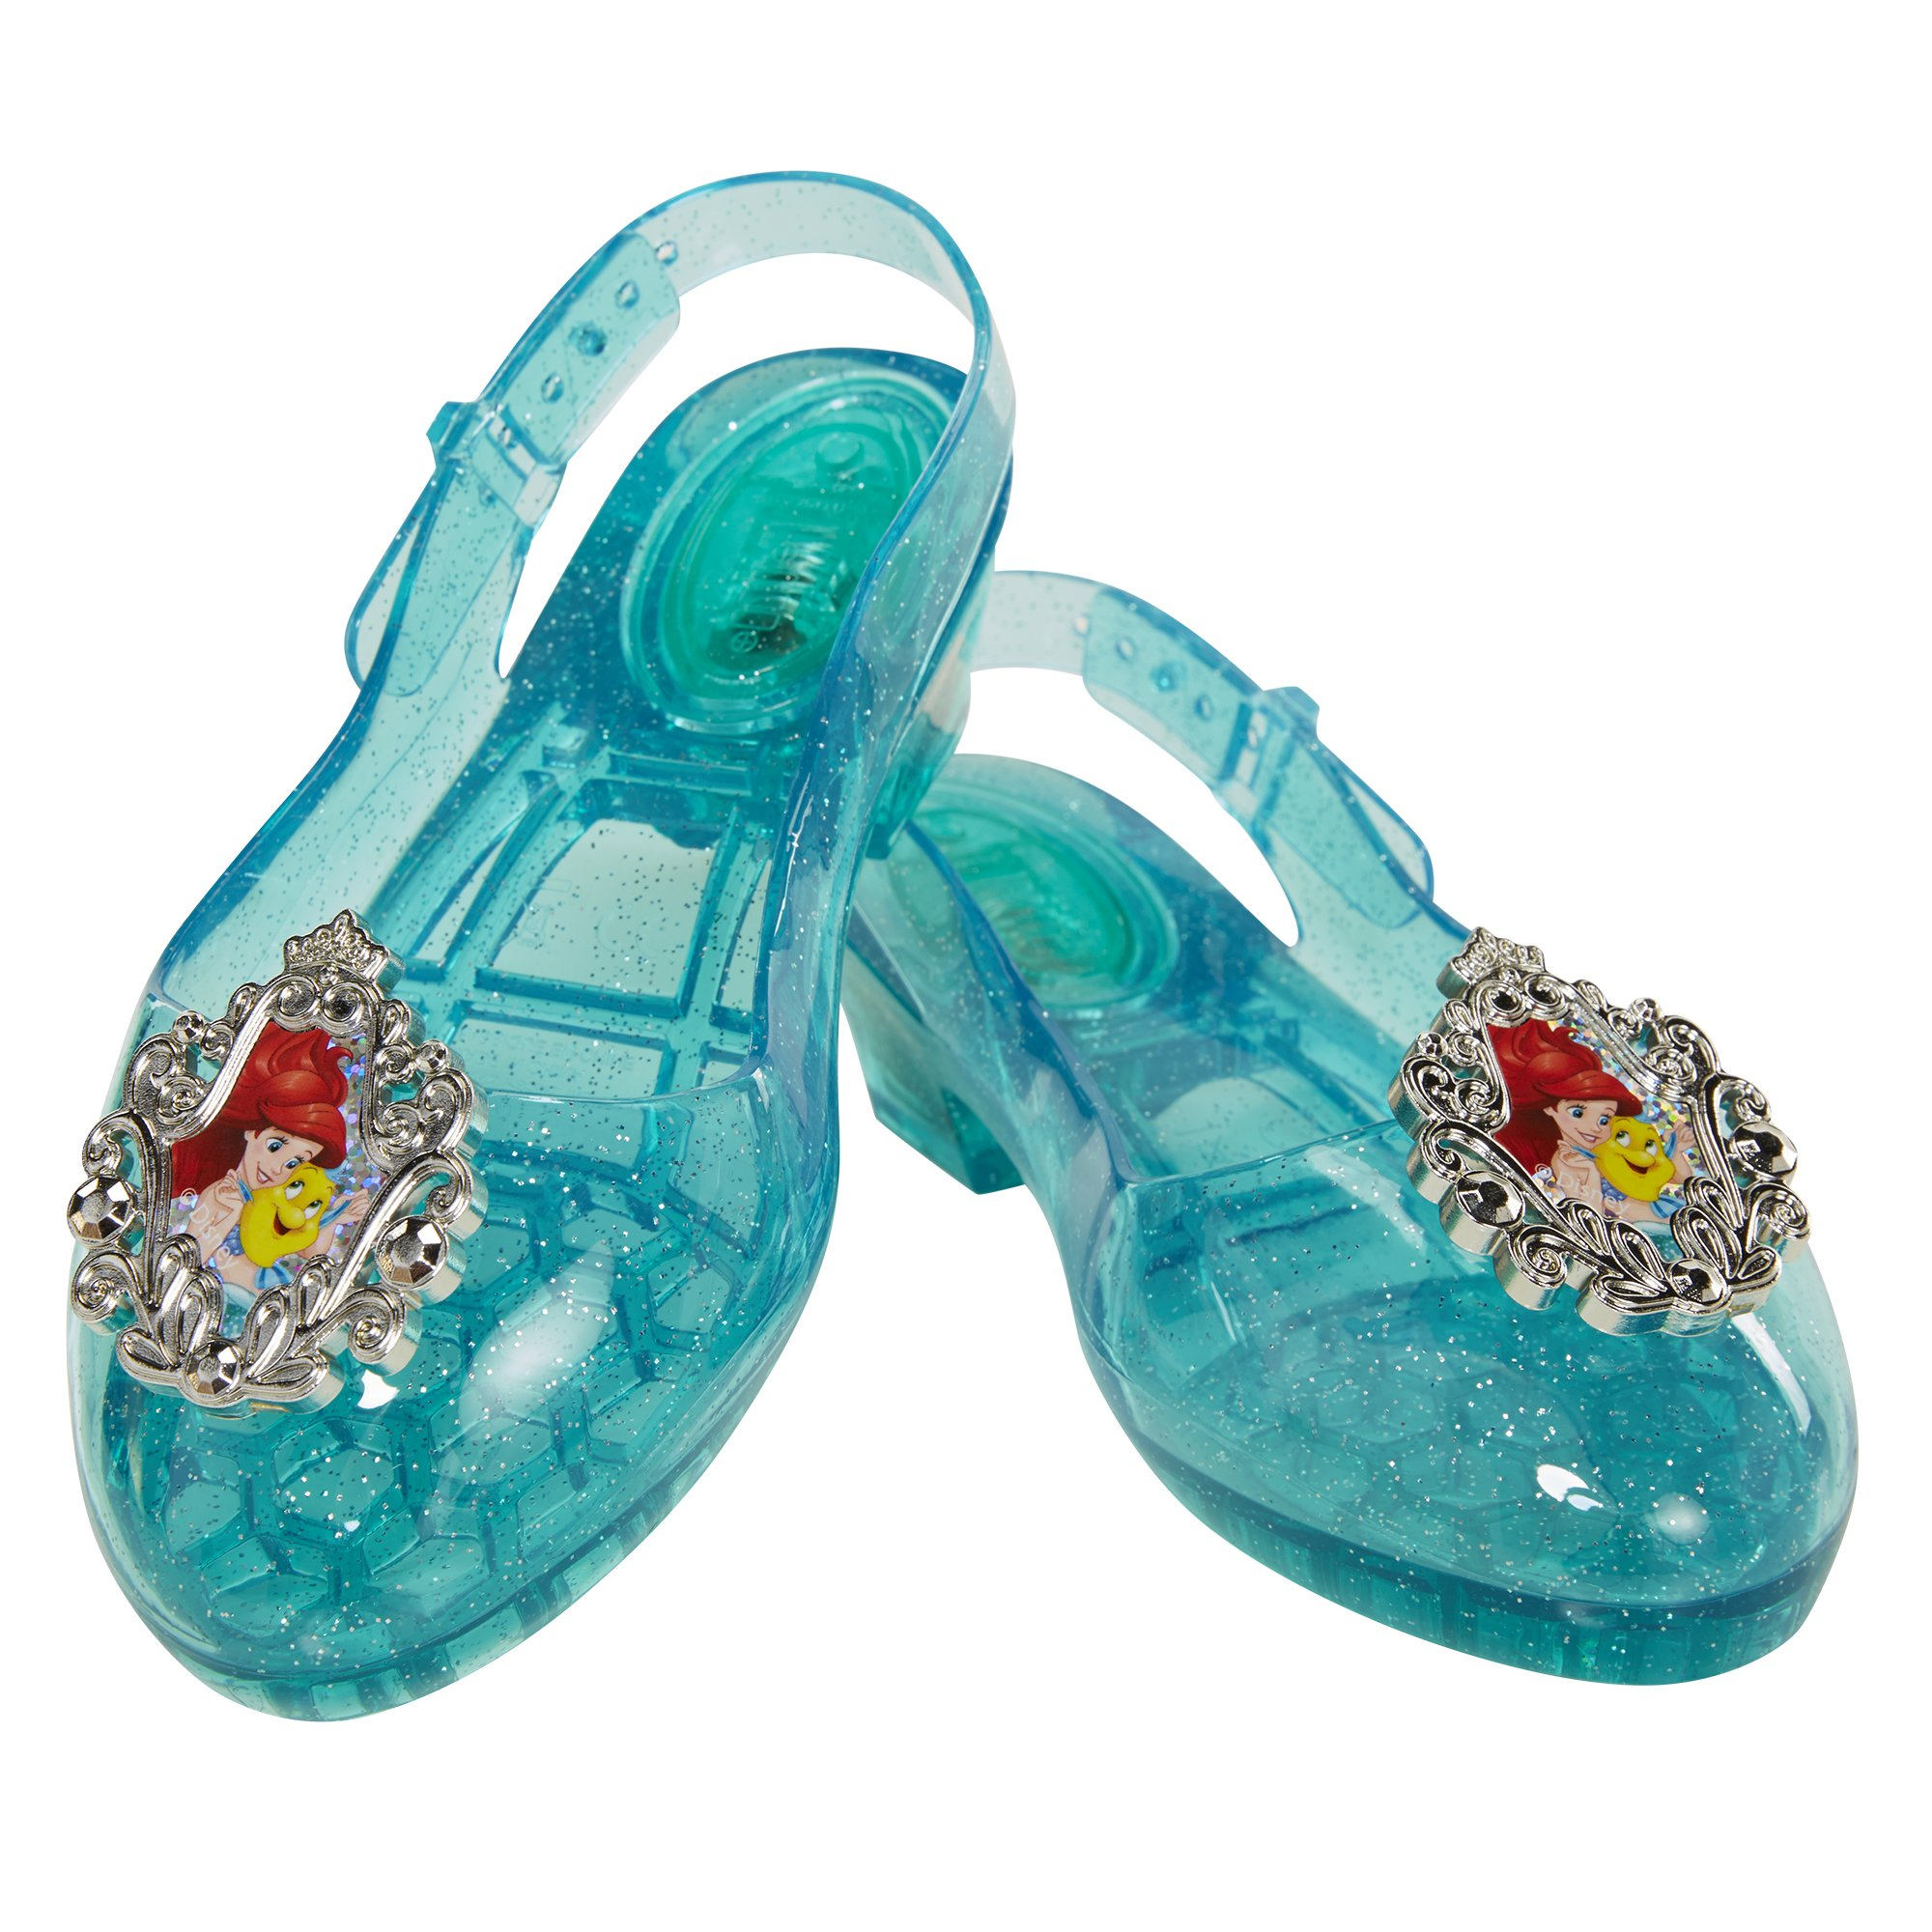 Disney Princess Ariel Light-Up Shoes